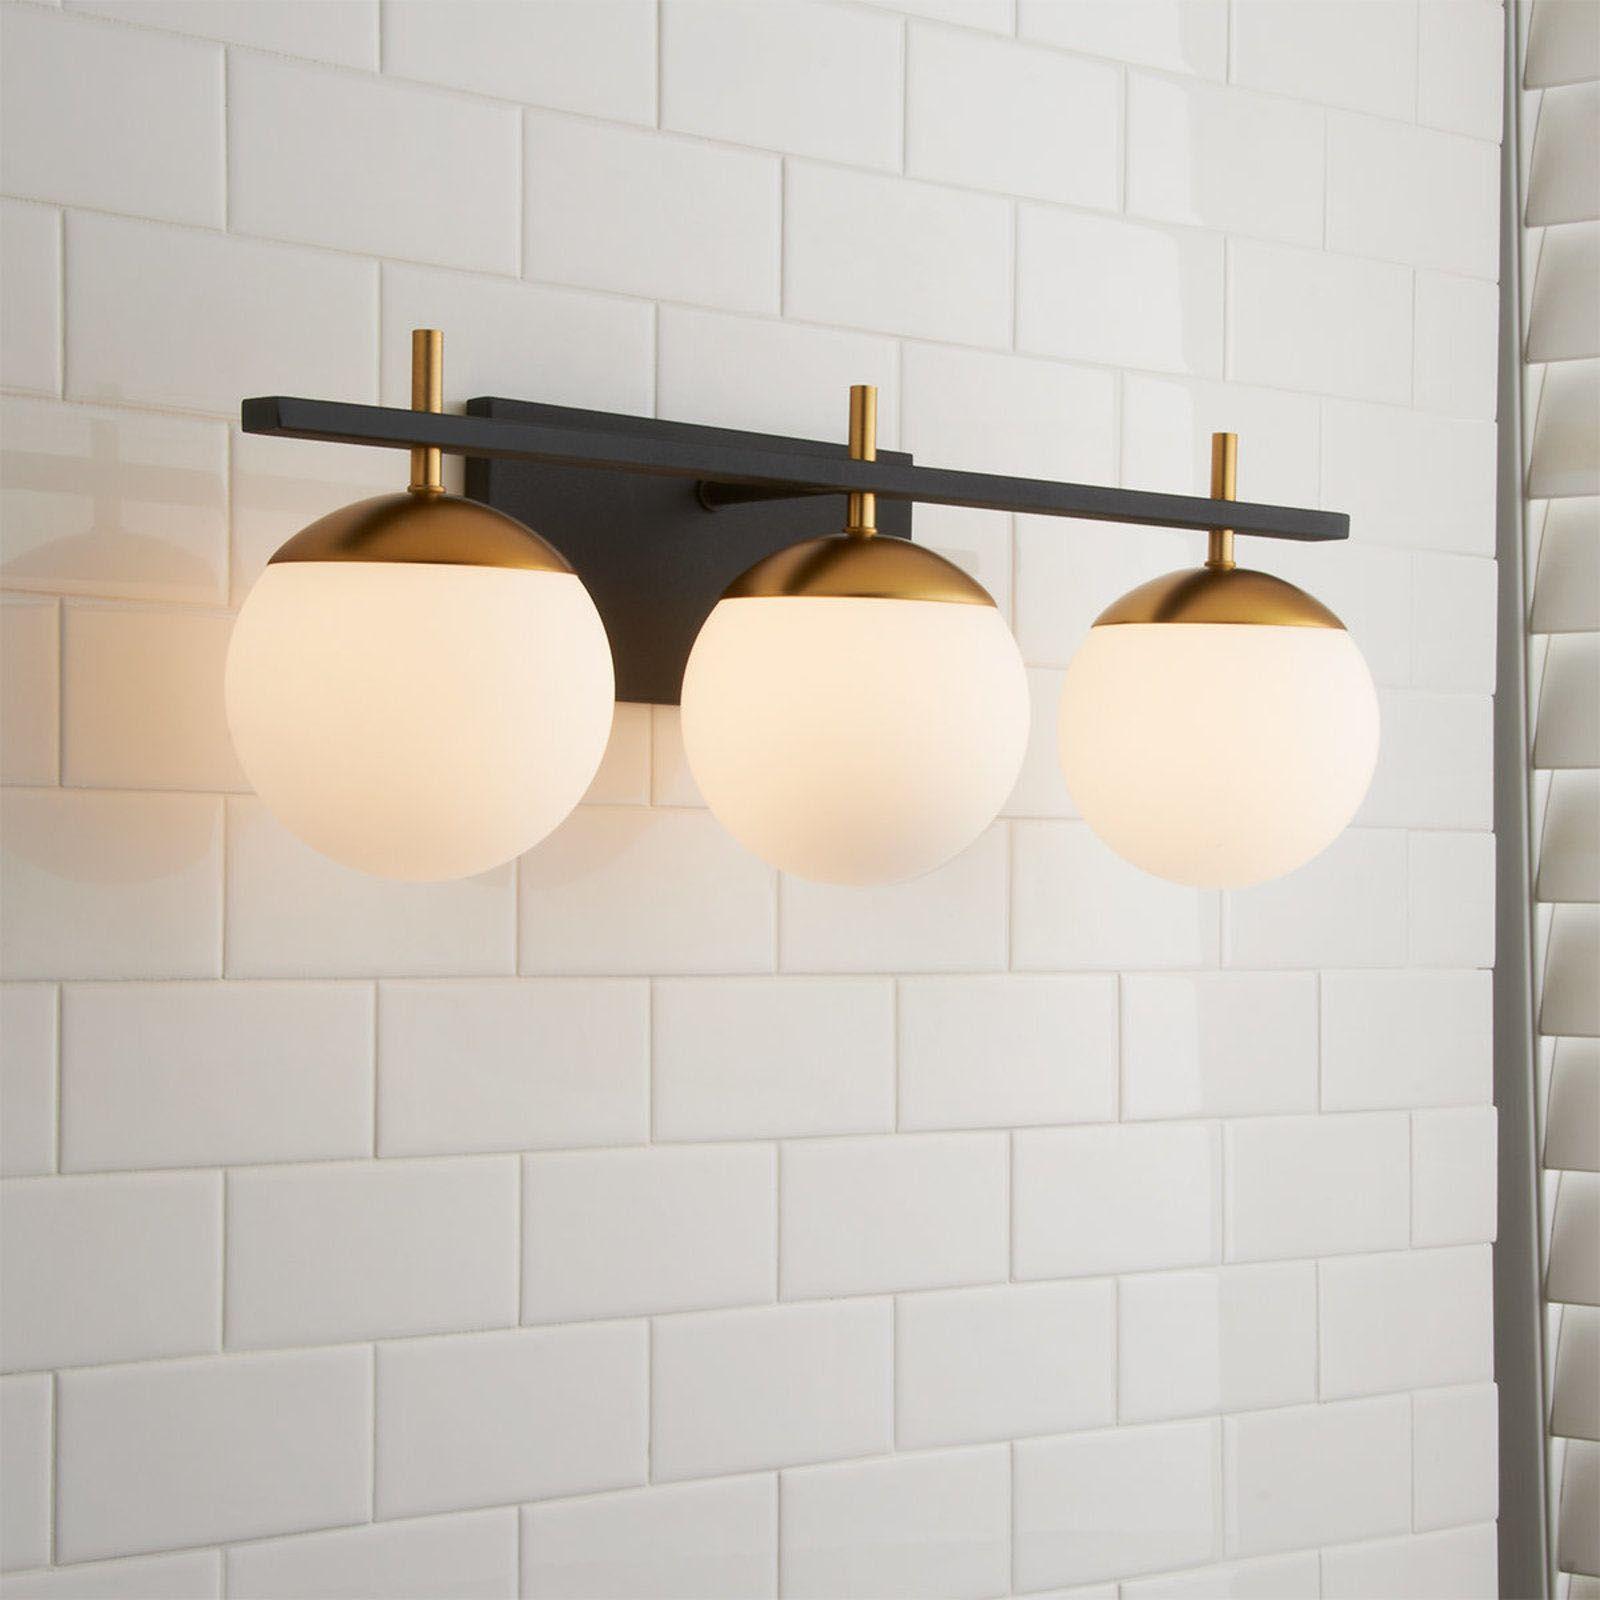 Elite 1920 S Bathroom Light Fixtures One And Only Interioropedia Com Vanity Lighting Black Vanity Light Bathroom Light Fixtures